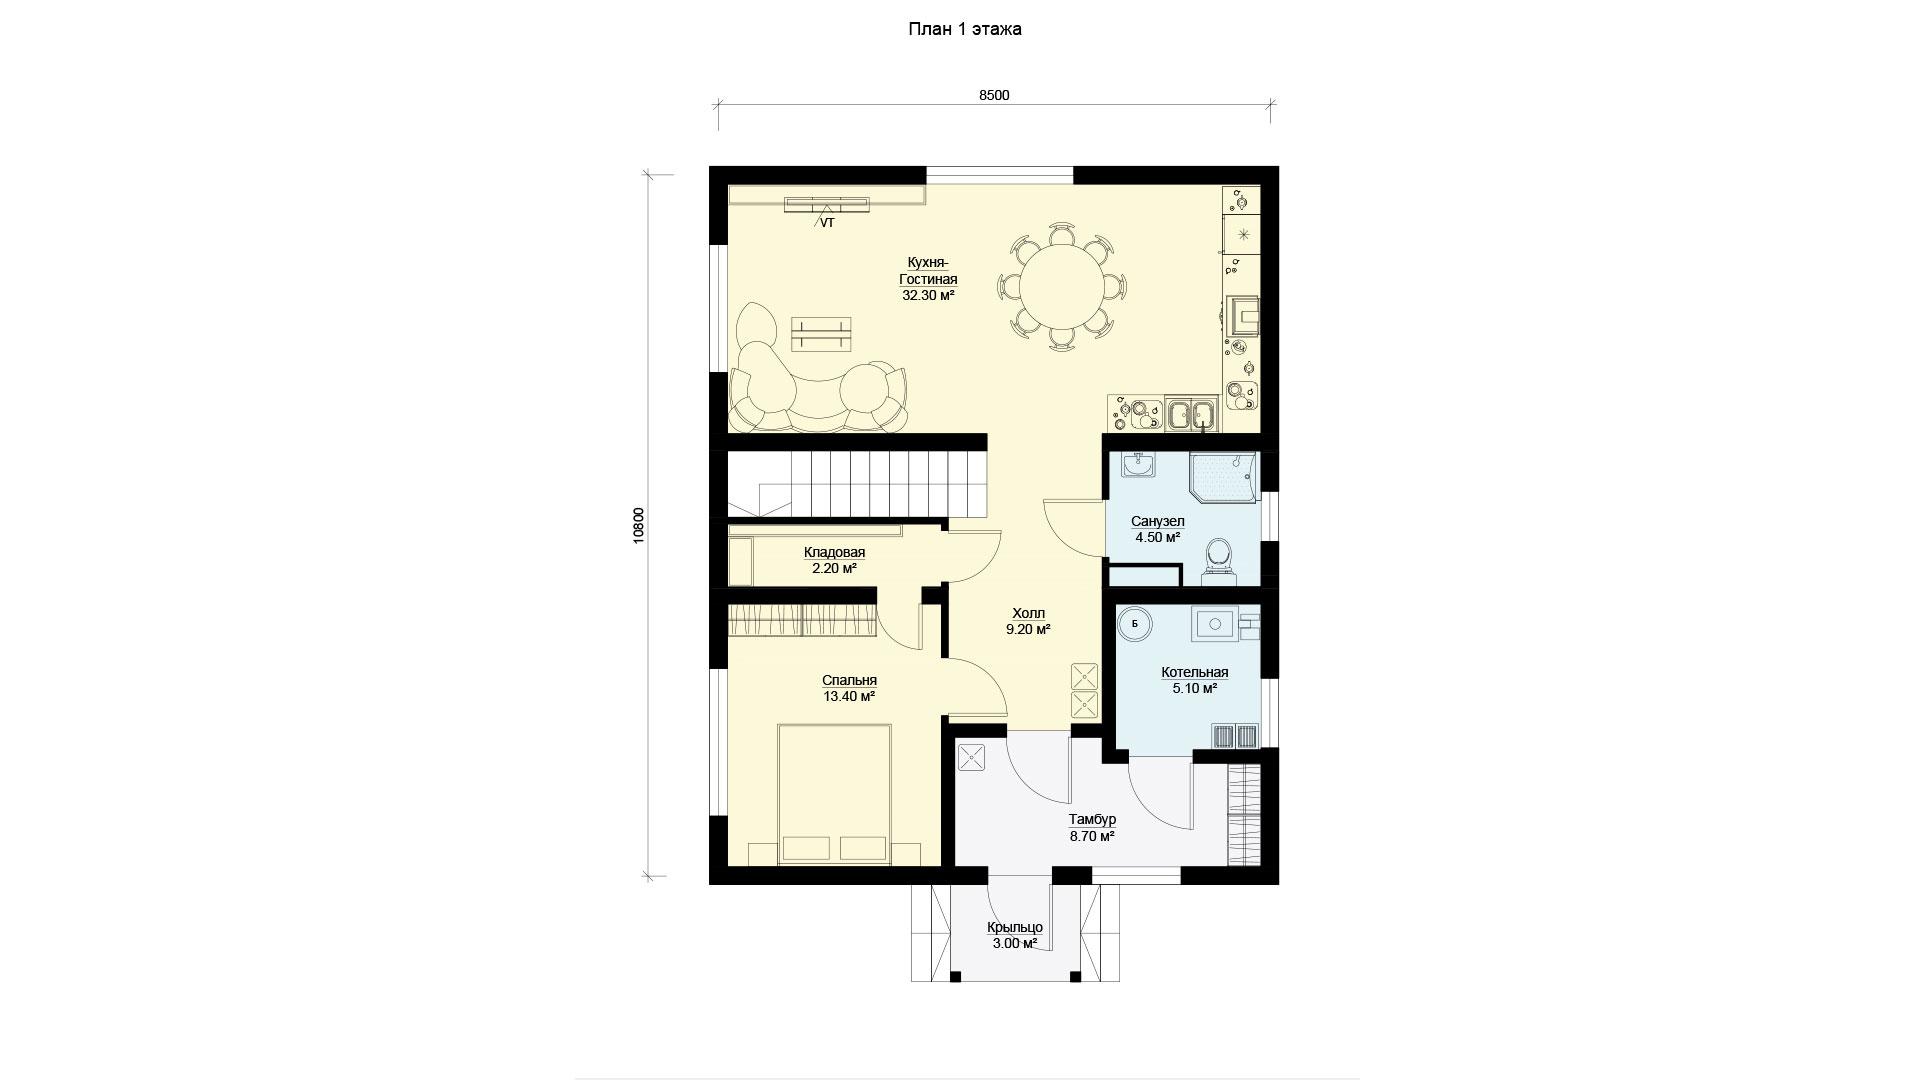 План первого этажа двухэтажного дома 10 на 8. Проект БЭНПАН БП-160/1.